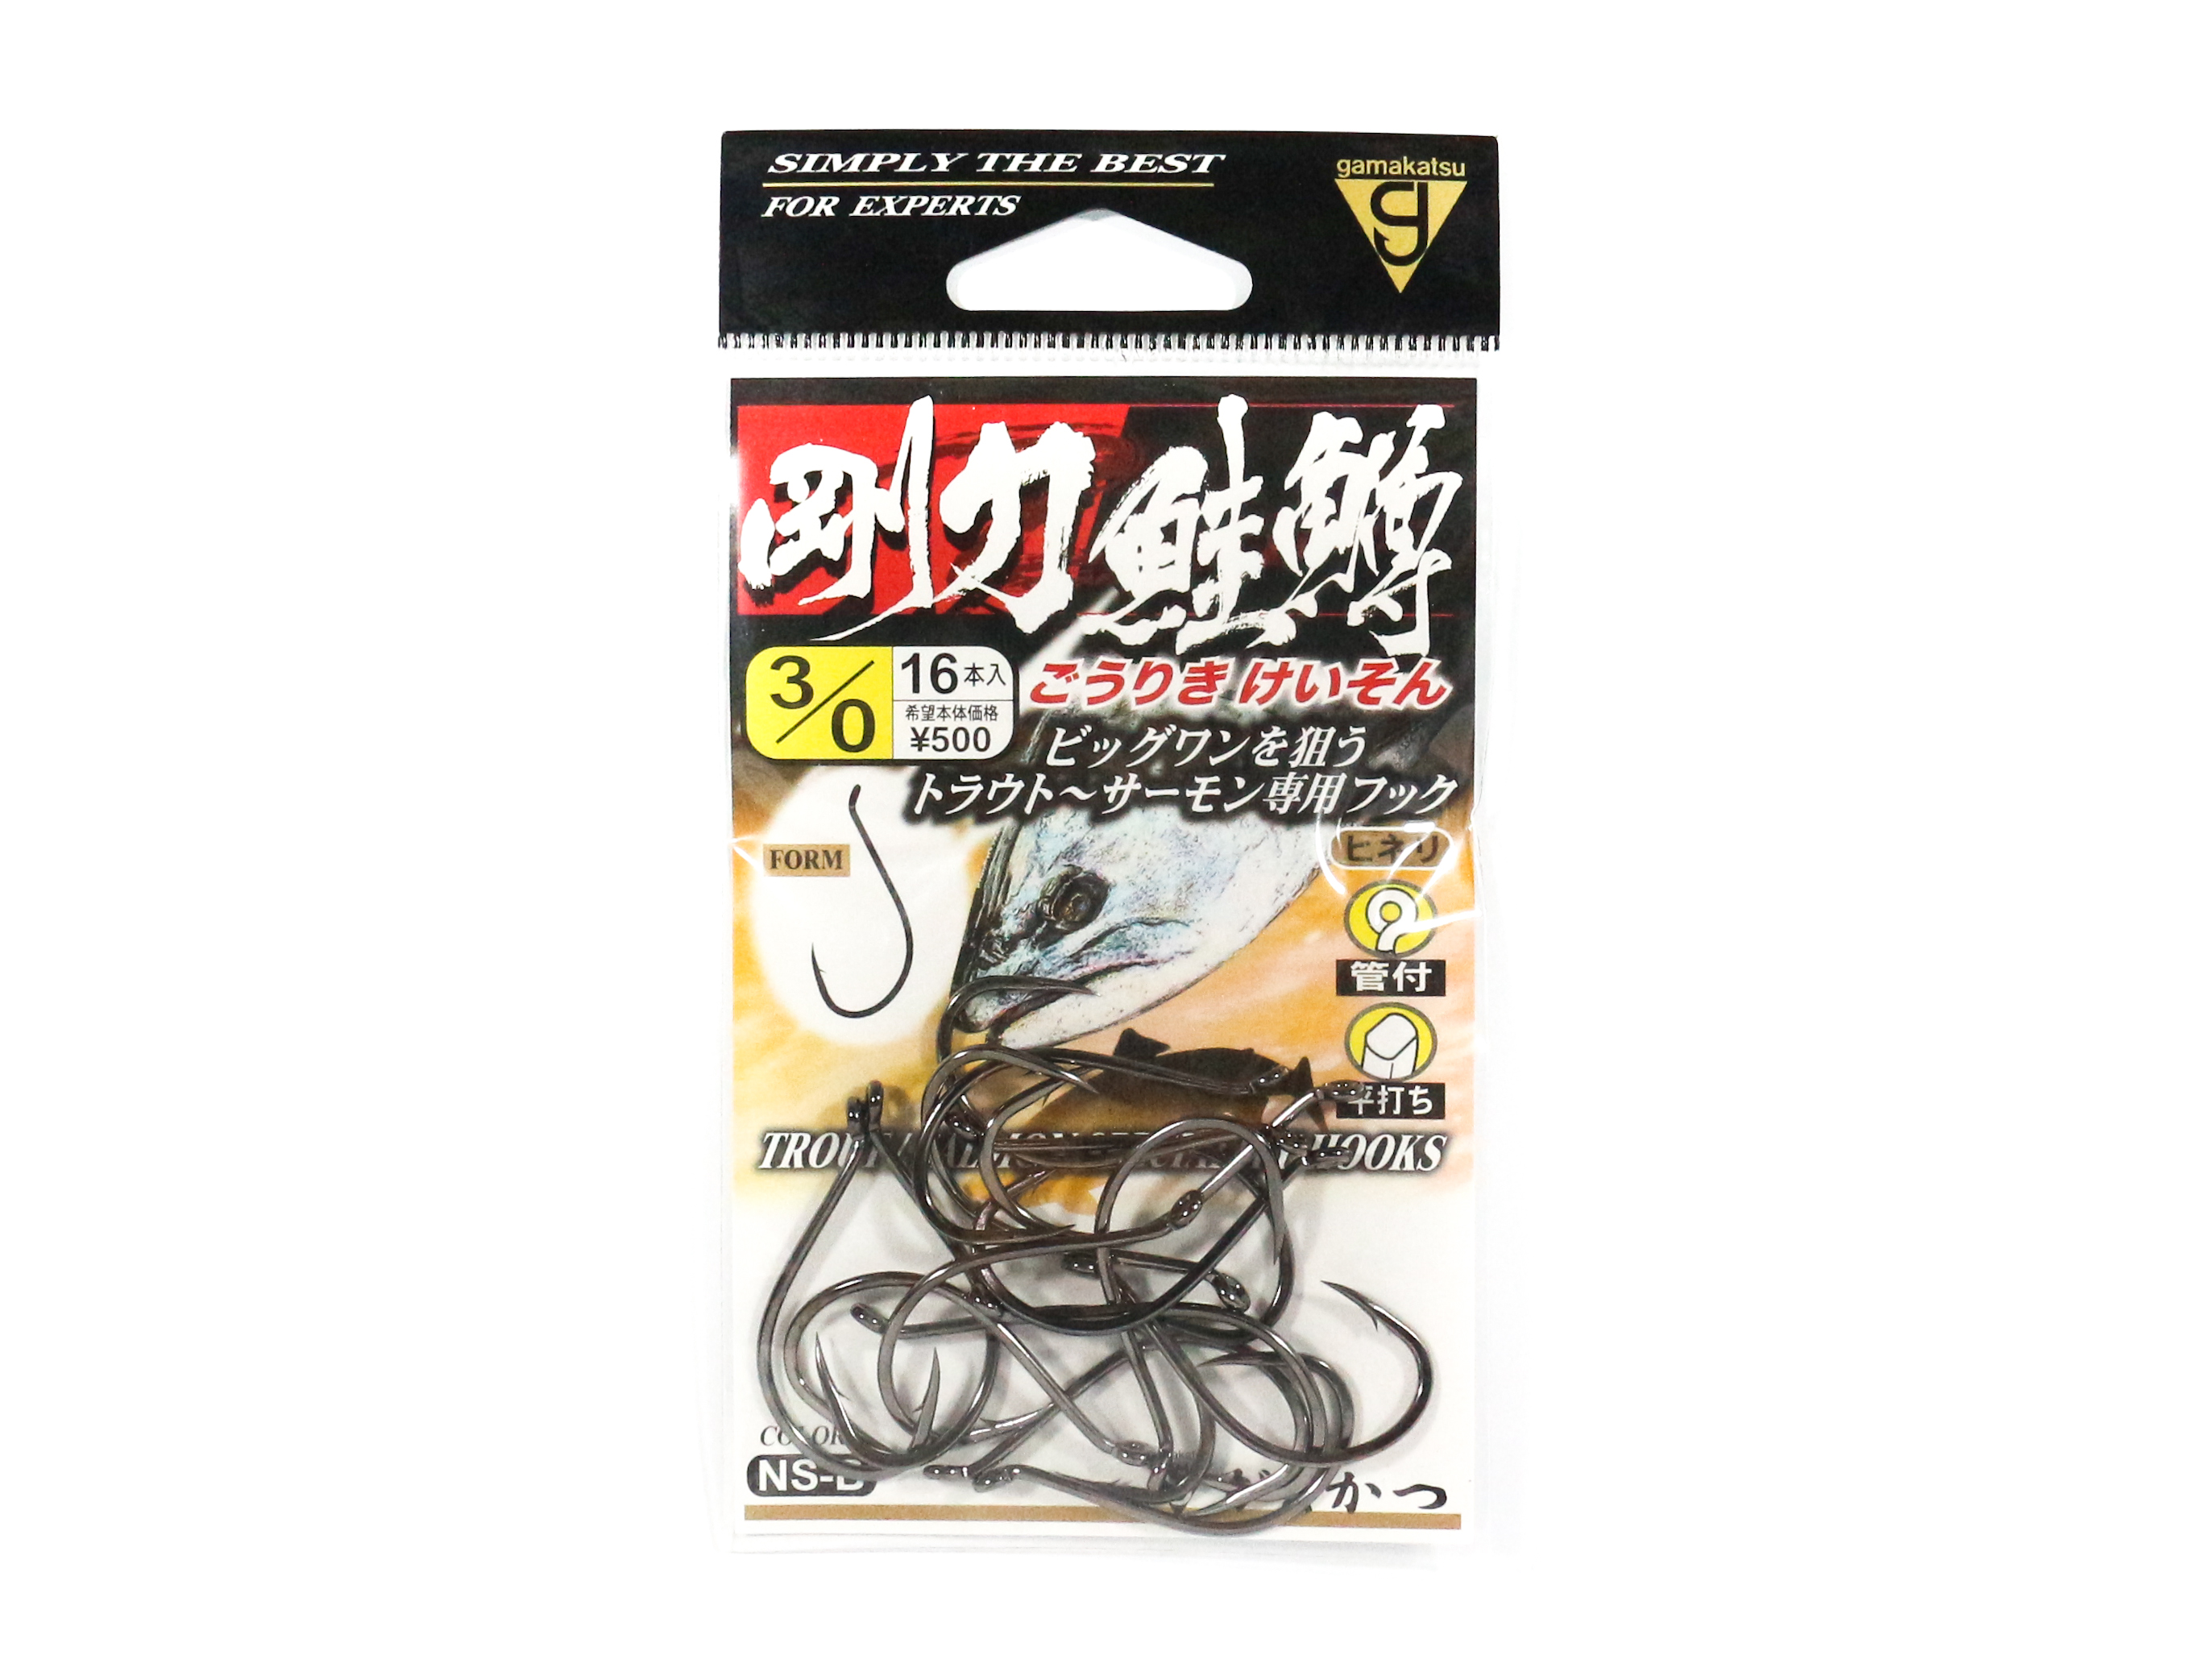 Gamakatsu Goriki Keison Trout Salmon Specialty Hook Size 3/0 ,16 Per pack (2270)